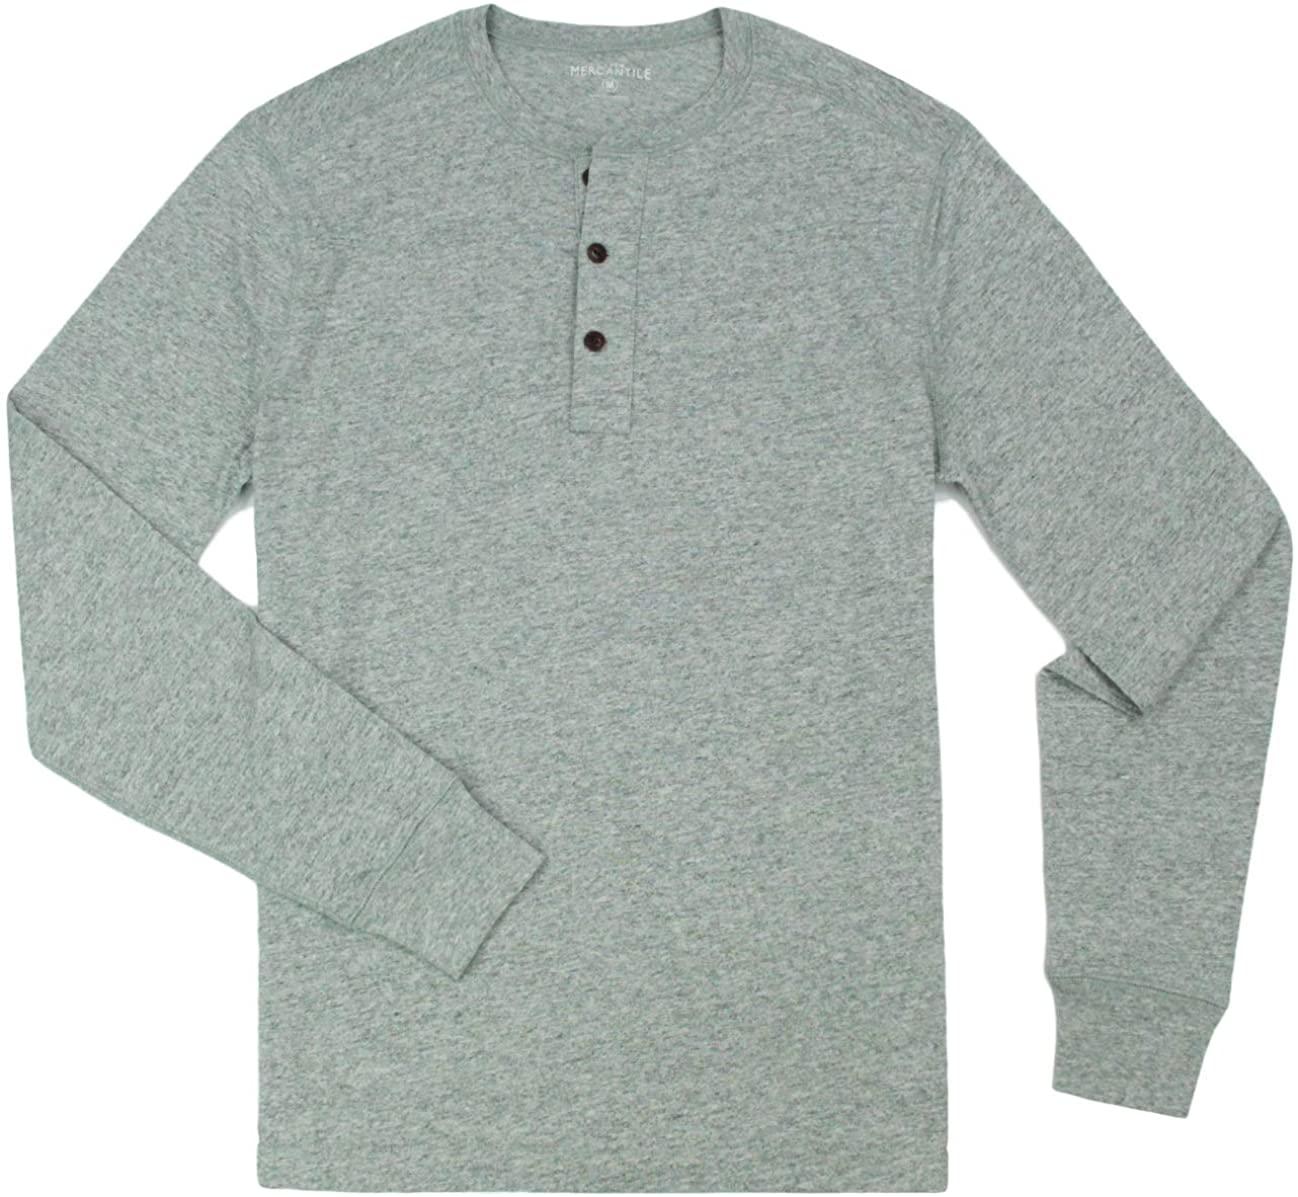 J. Crew Men's Long Sleeve Cotton Henley Shirt, Multiple Colors and Sizes